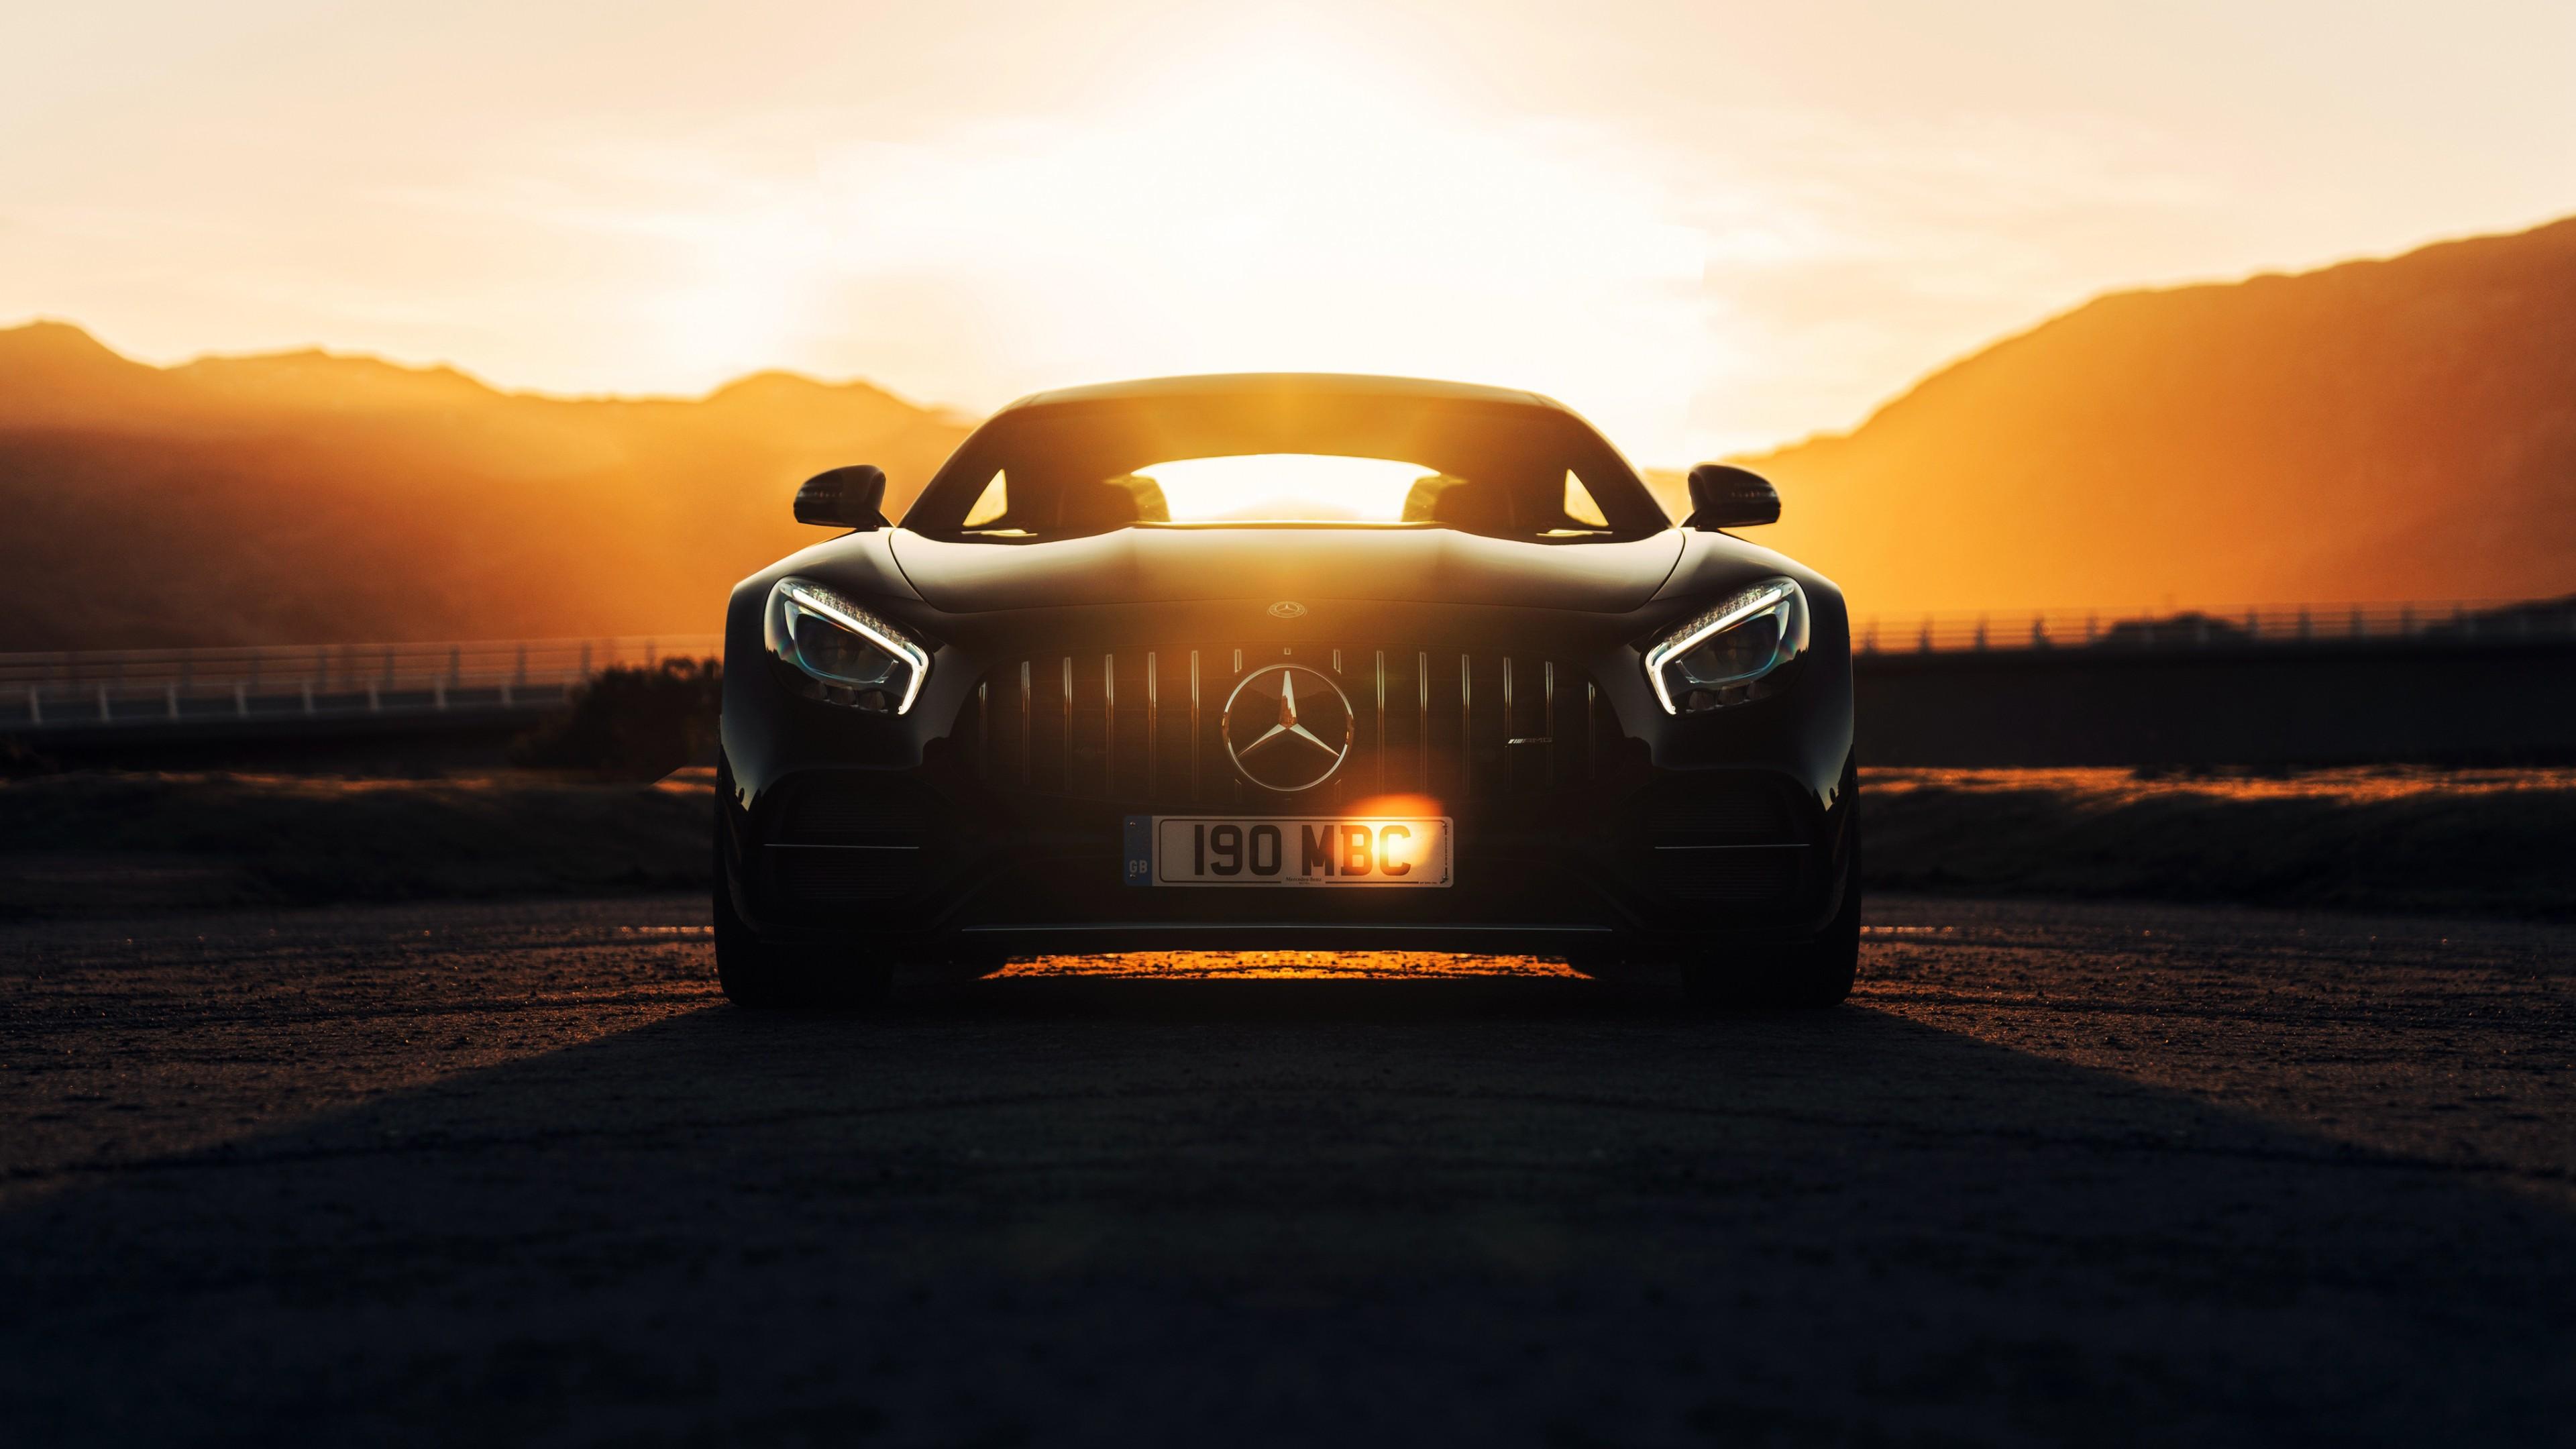 Luxury 3d Wallpaper 2018 Mercedes Amg Gt C 4k Wallpapers Hd Wallpapers Id